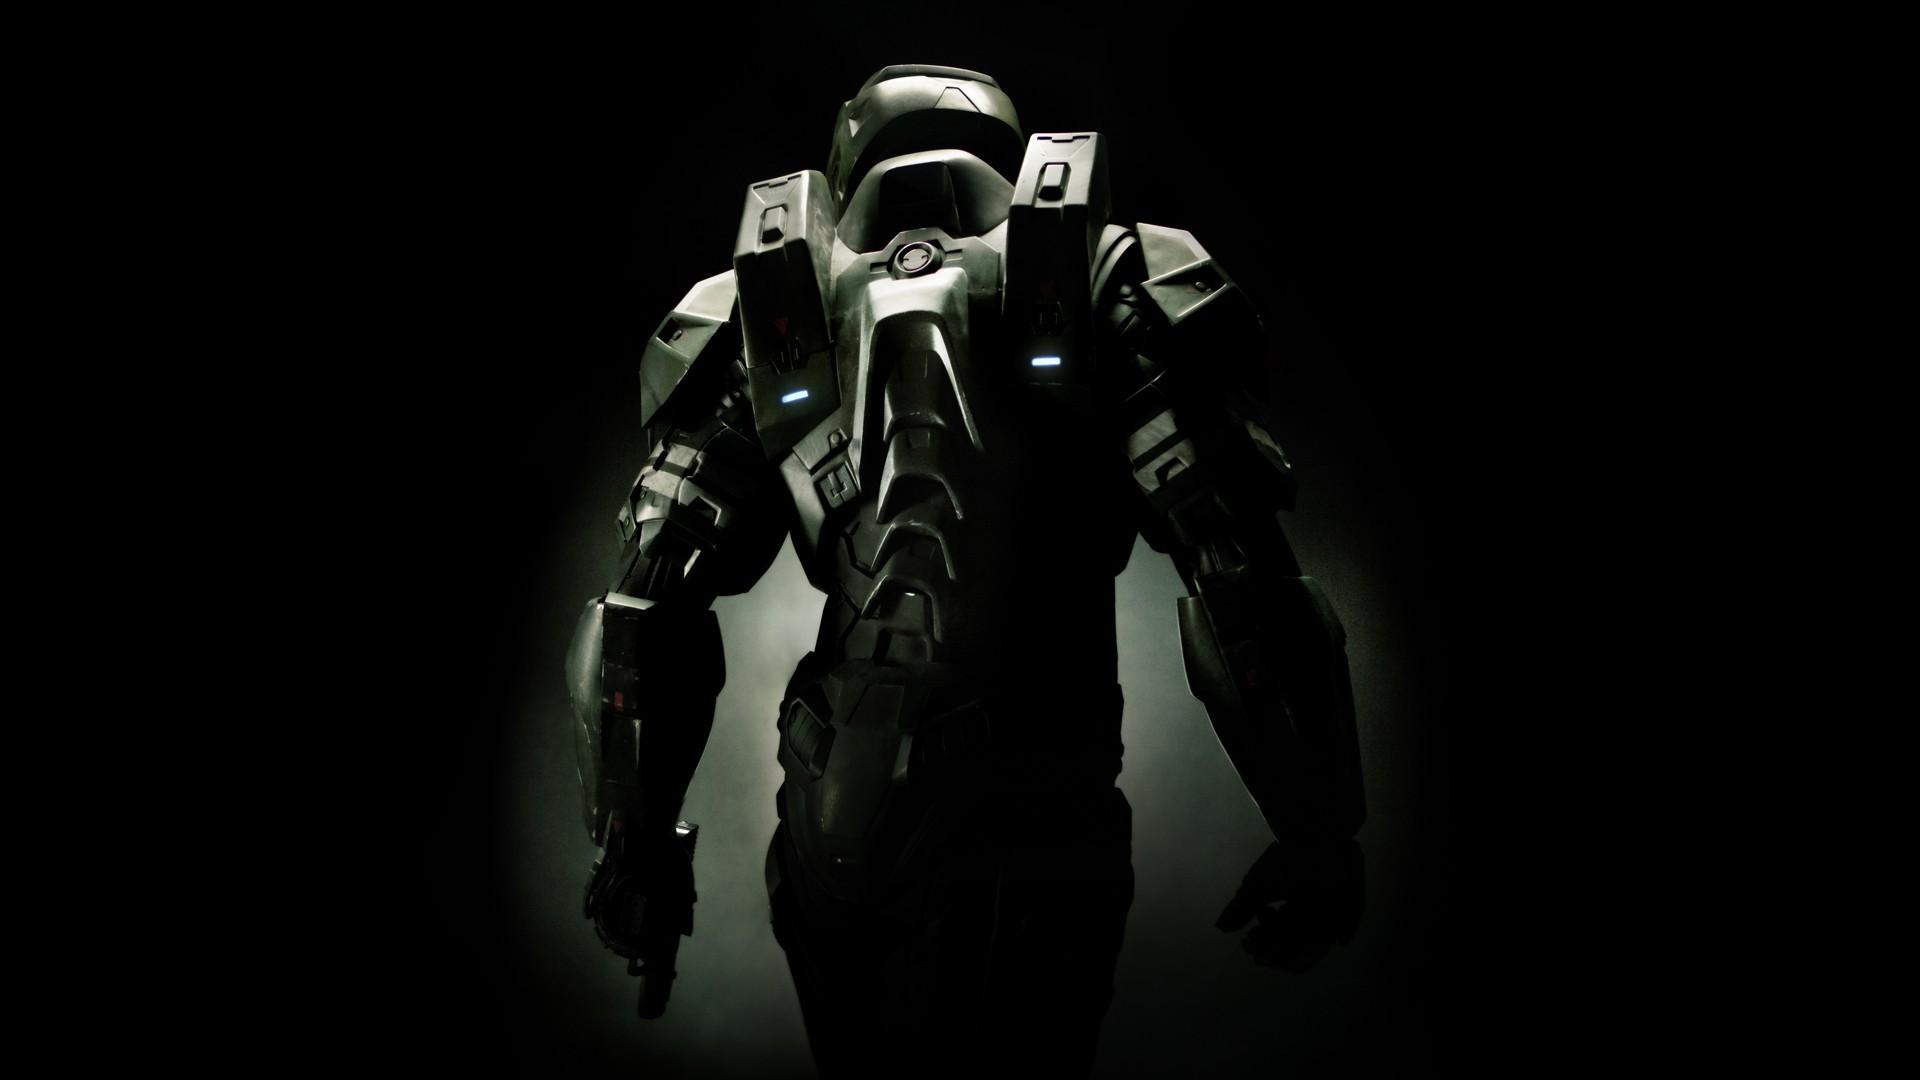 Wallpaper Black Monochrome Halo Master Chief Darkness